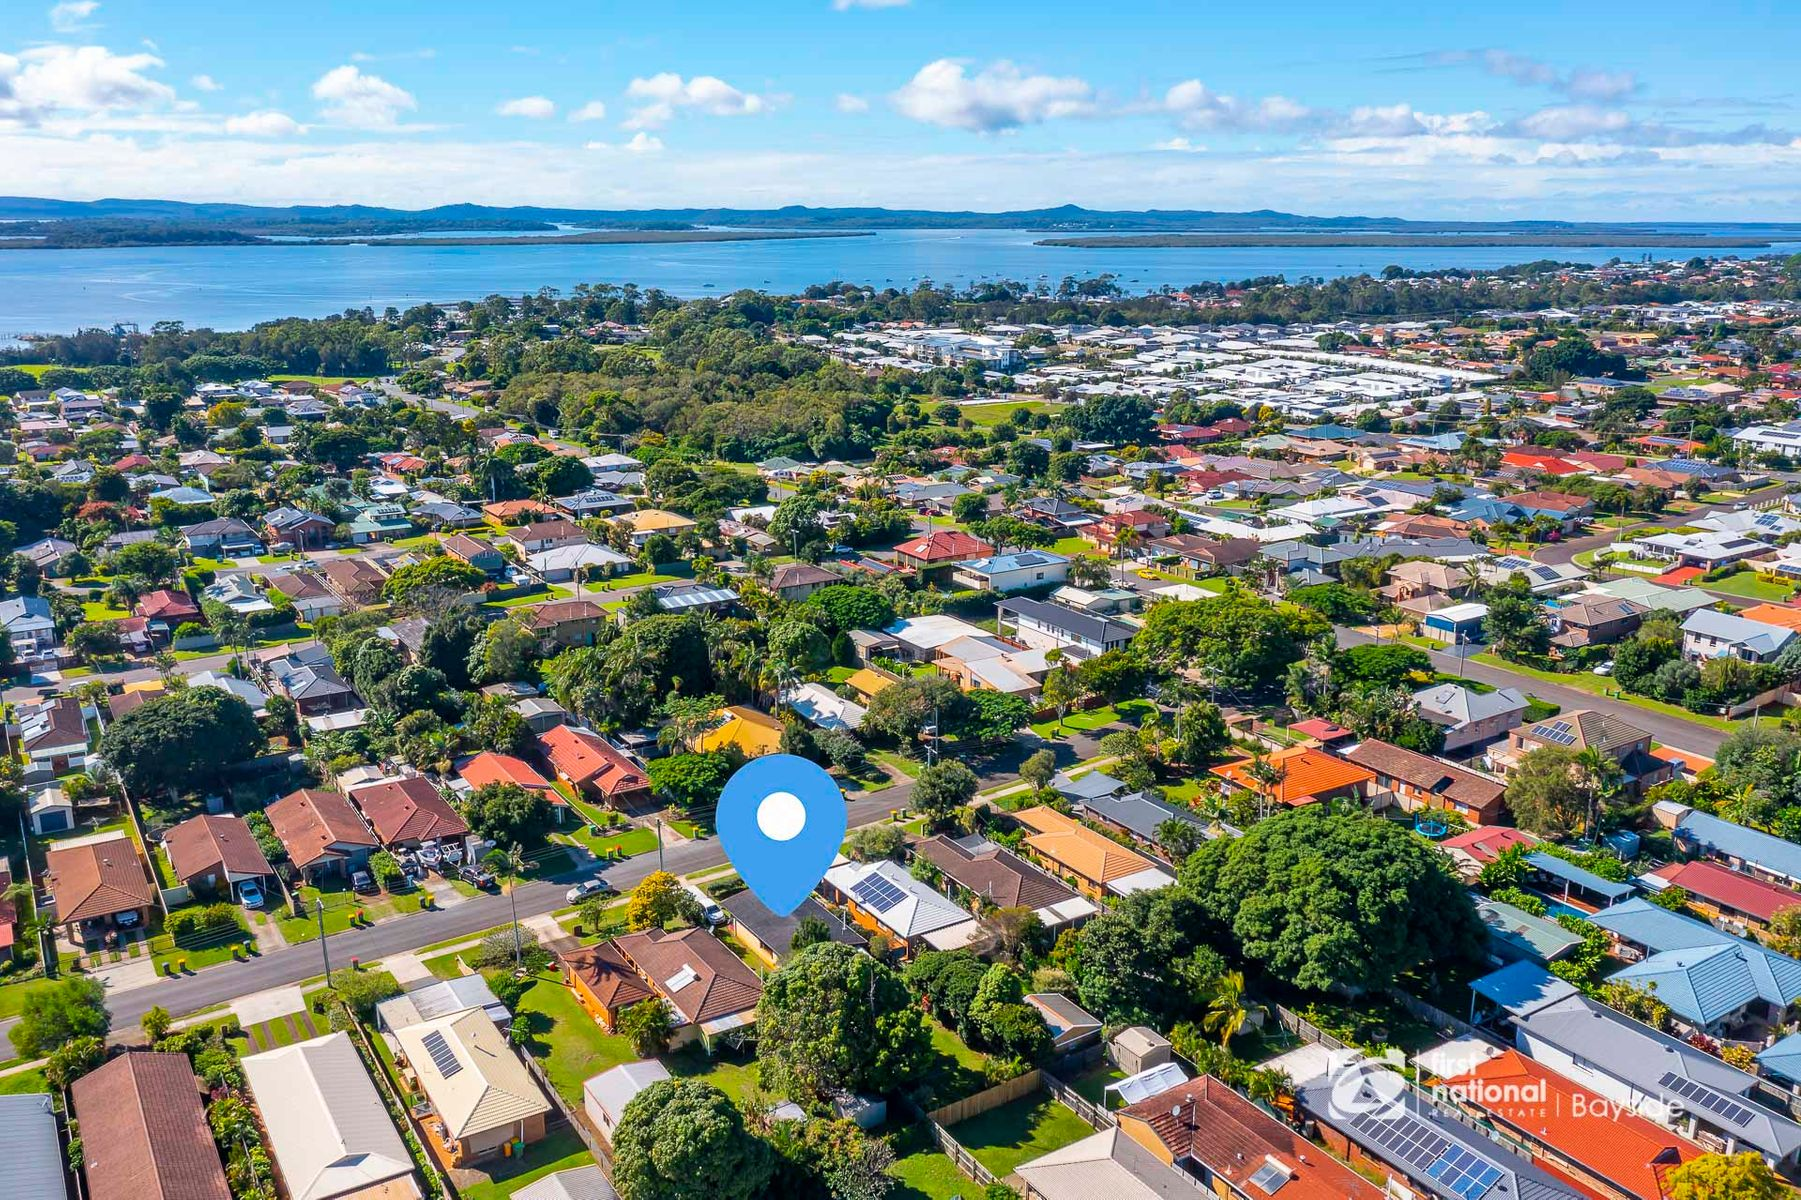 223 Cane Street, Redland Bay, QLD 4165